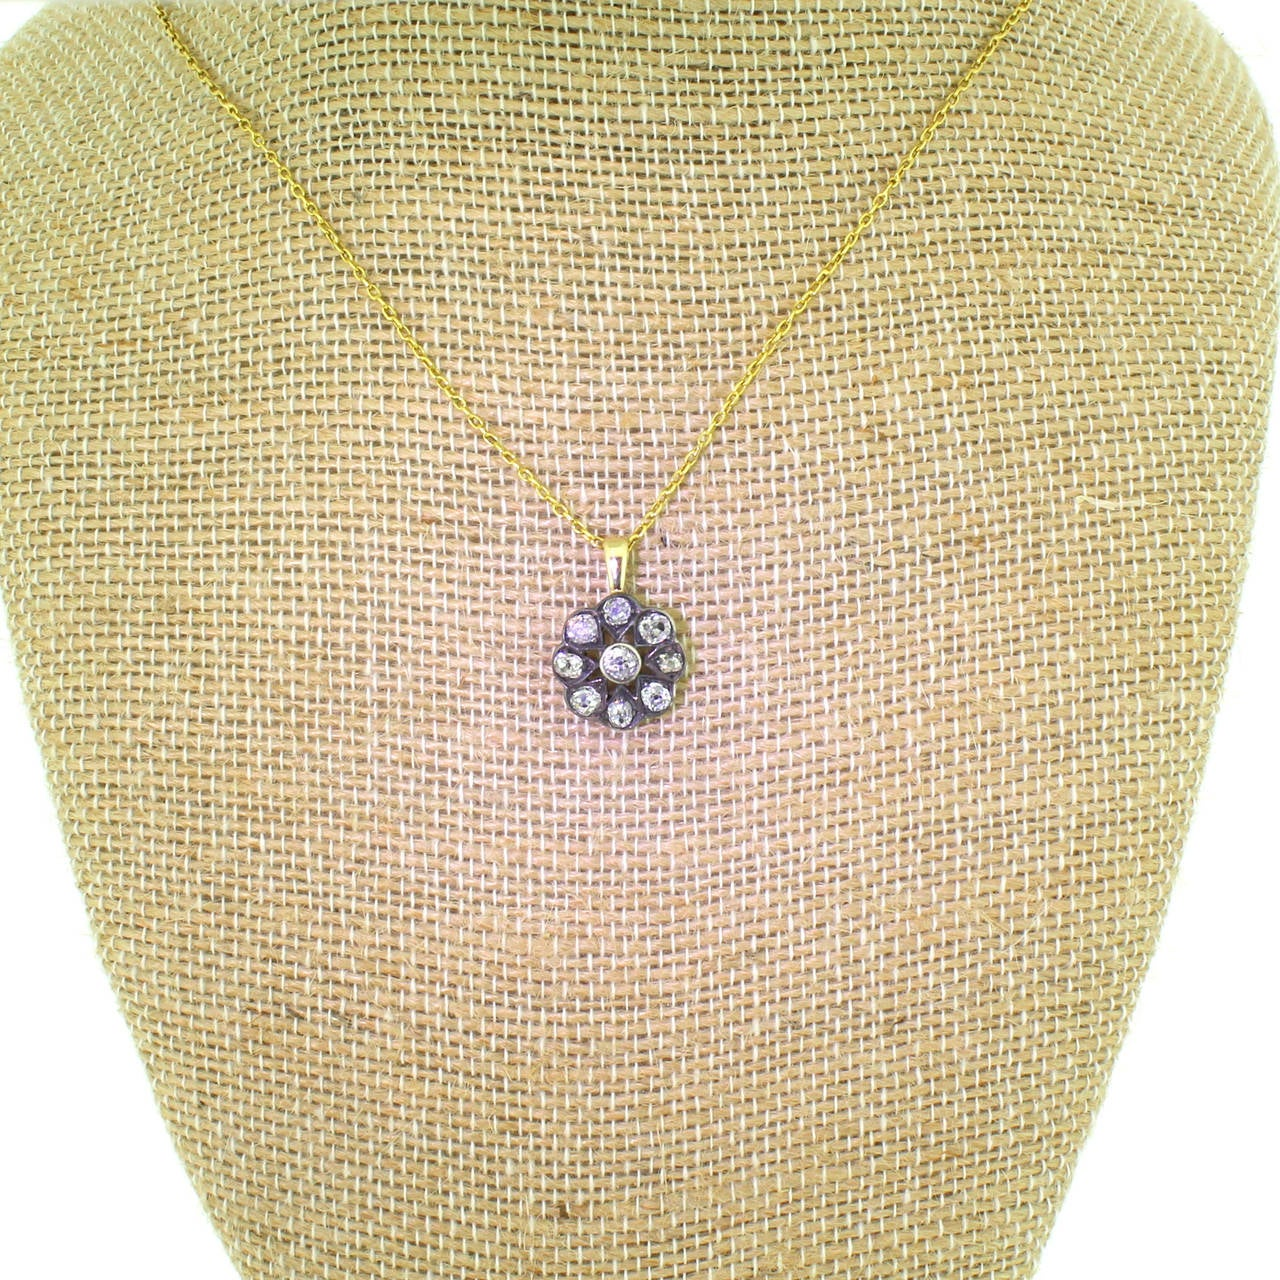 Victorian 1.20 Carat Old Cut Diamond Gold Cluster Pendant 4